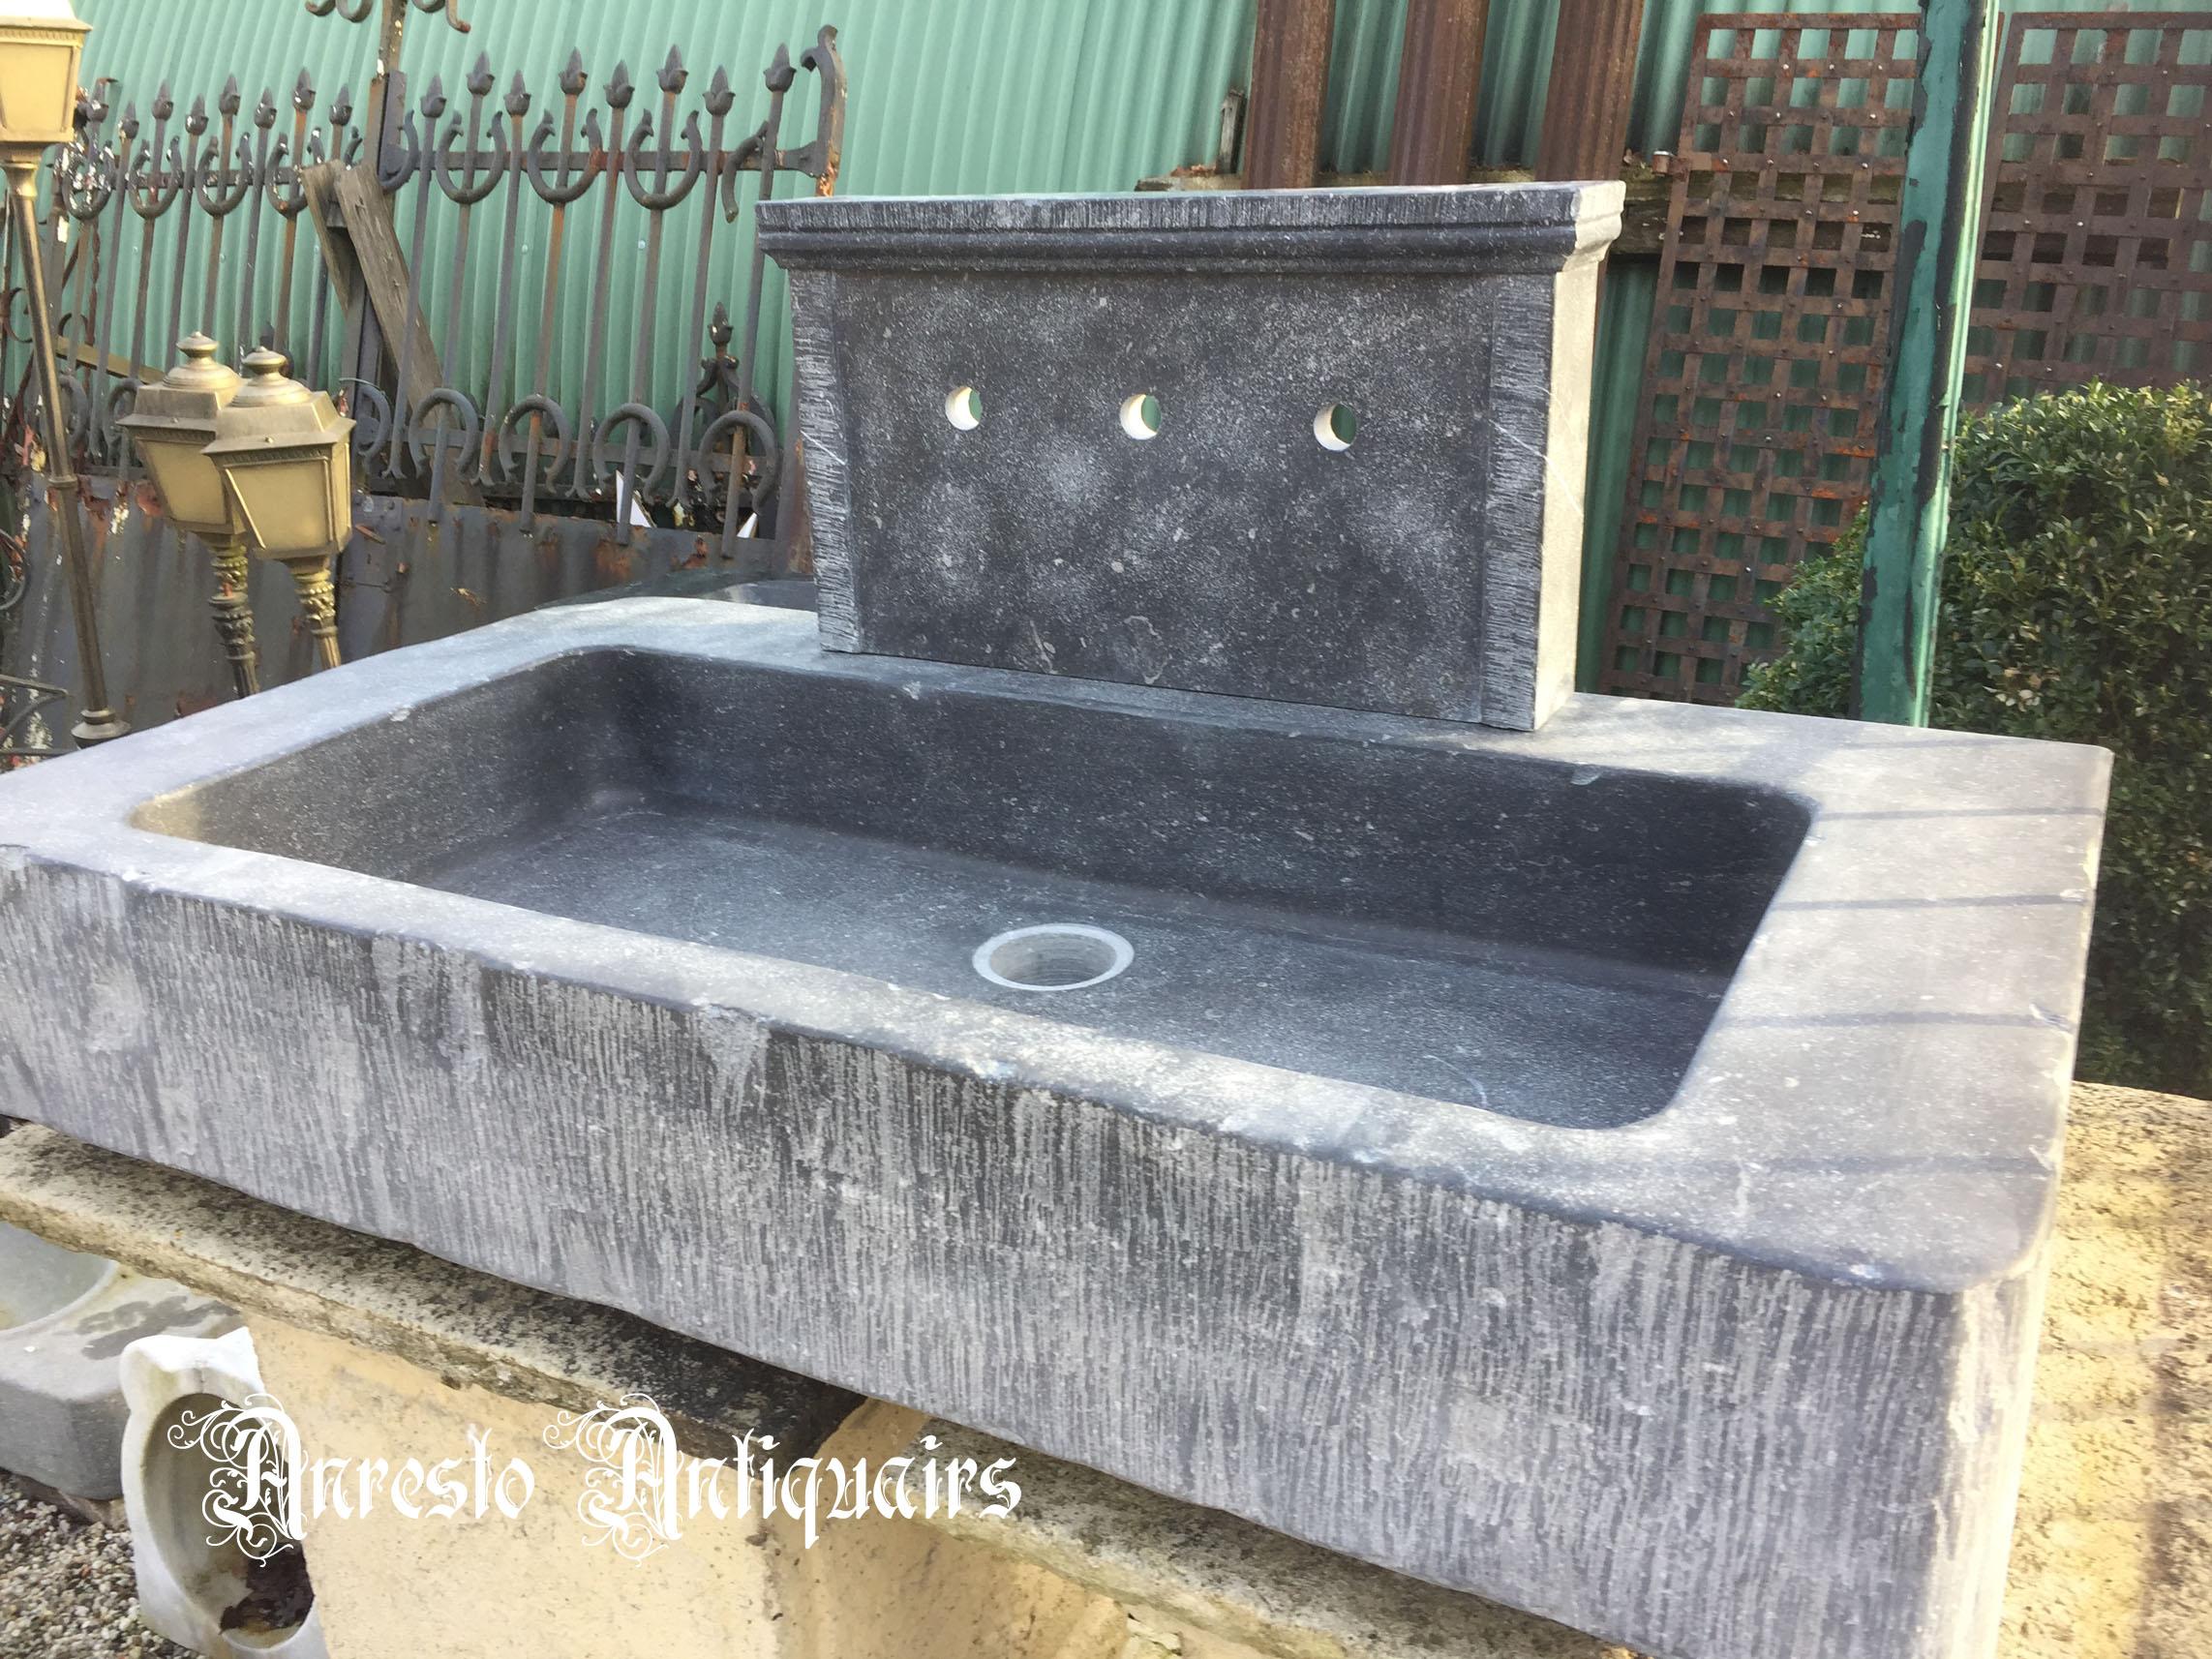 Ref. 38 – Handgekapte arduinen spoelbak gekapt uit oude steen, wasbak gekapt uit oude blauwsteen